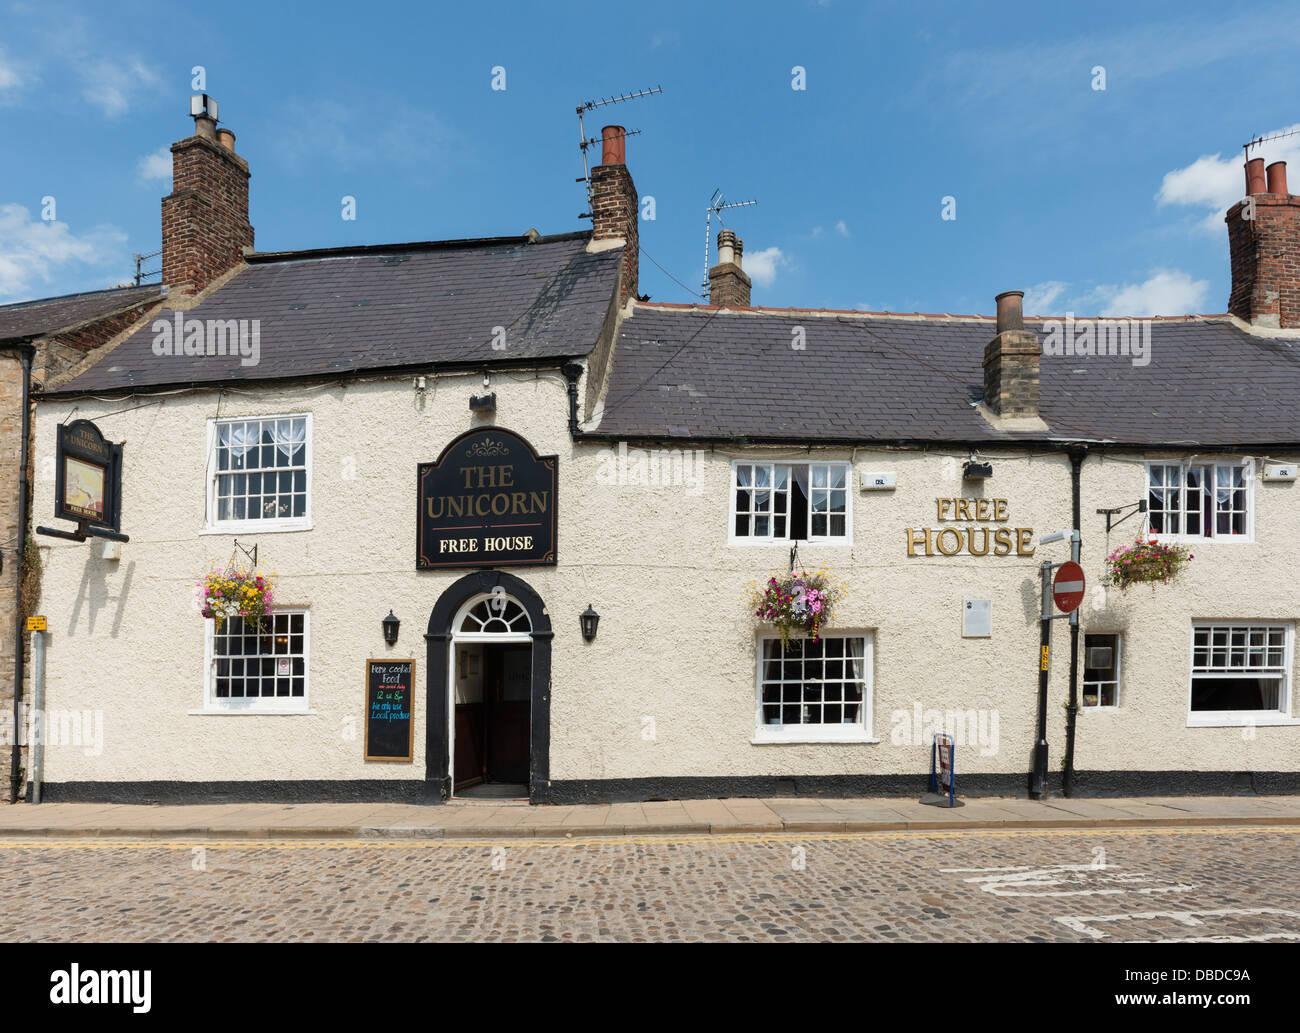 The Unicorn Inn, Richmond, North Yorkshire - Stock Image